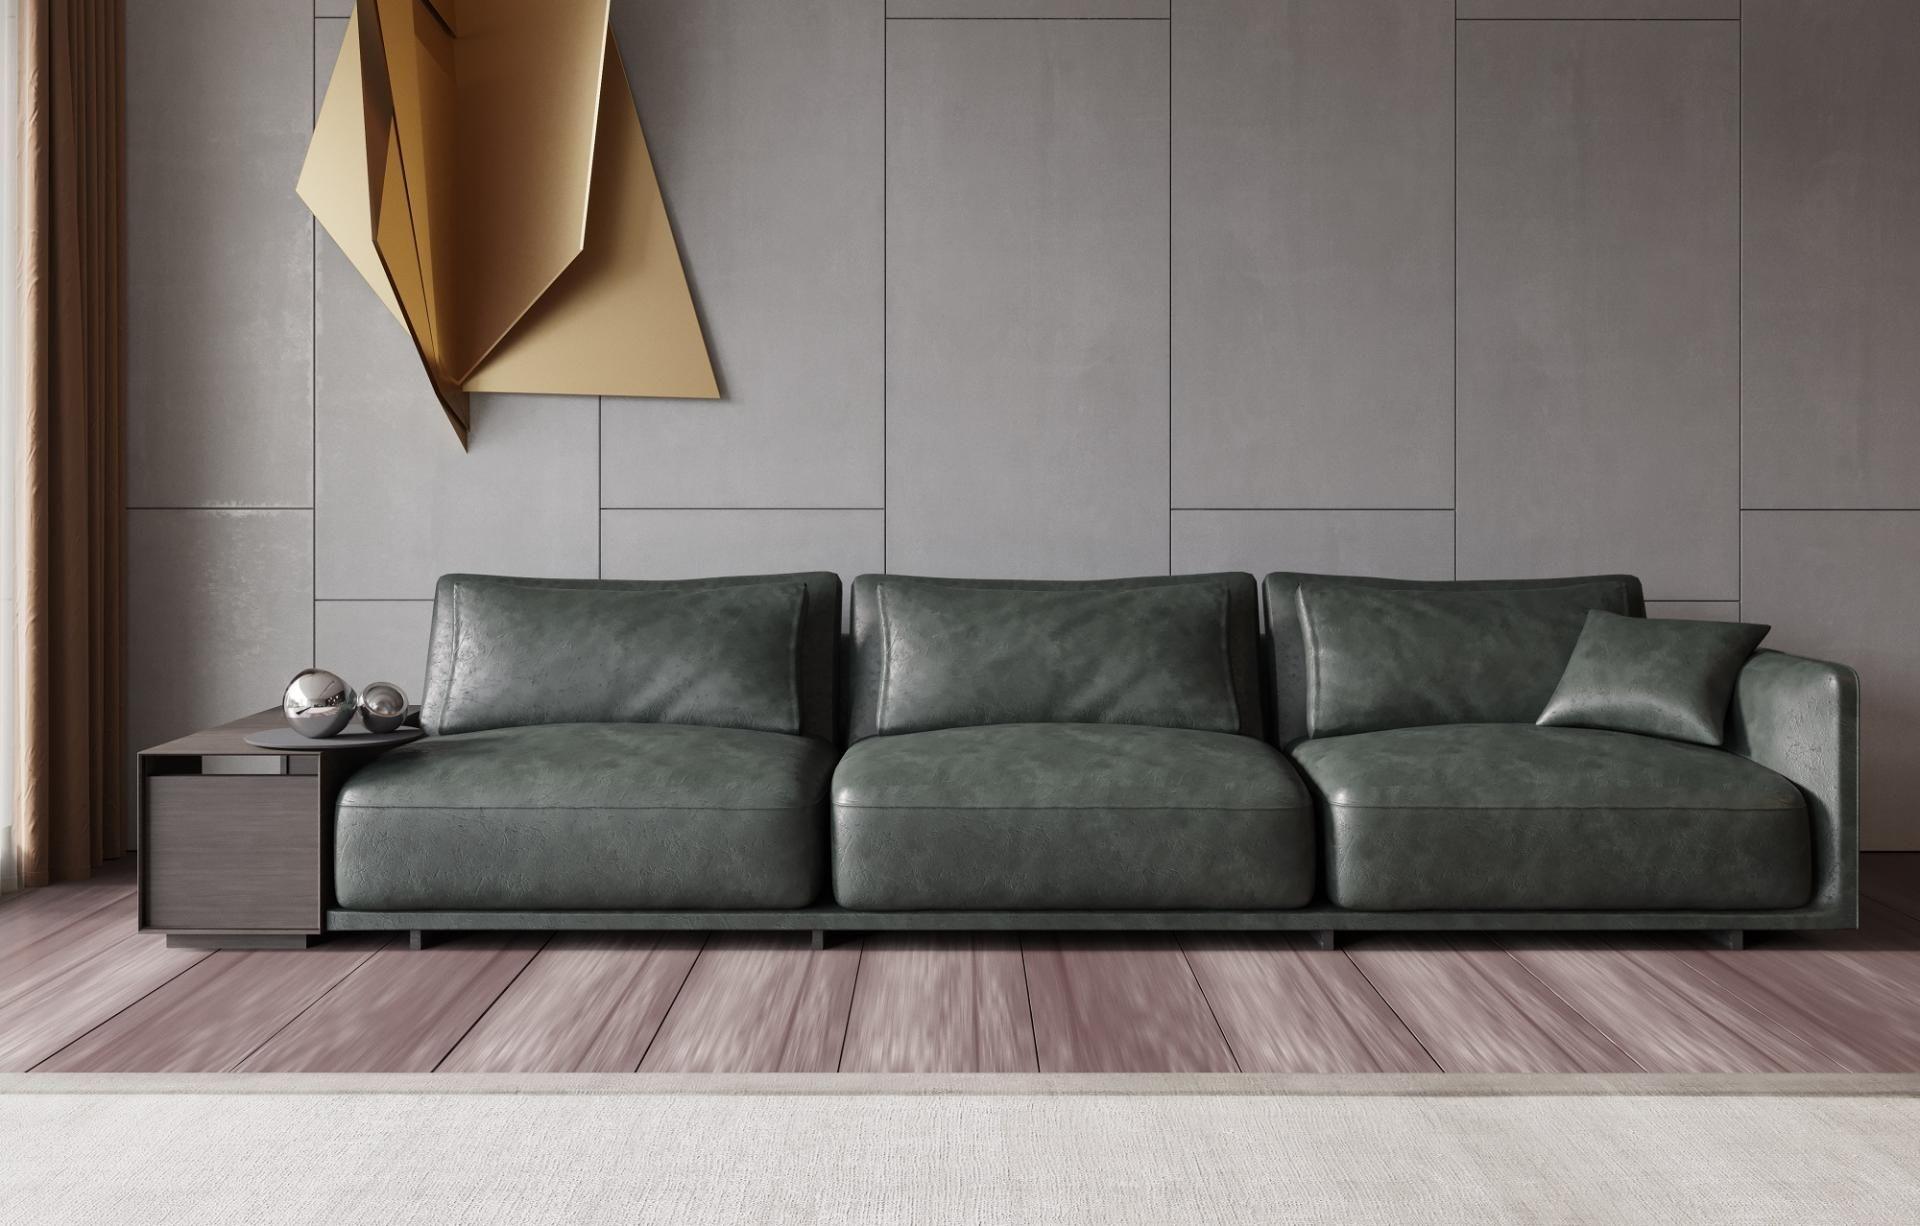 Sumela Koltuk Takimi Classic Sofa Designs Home Decor Furniture Home Decor